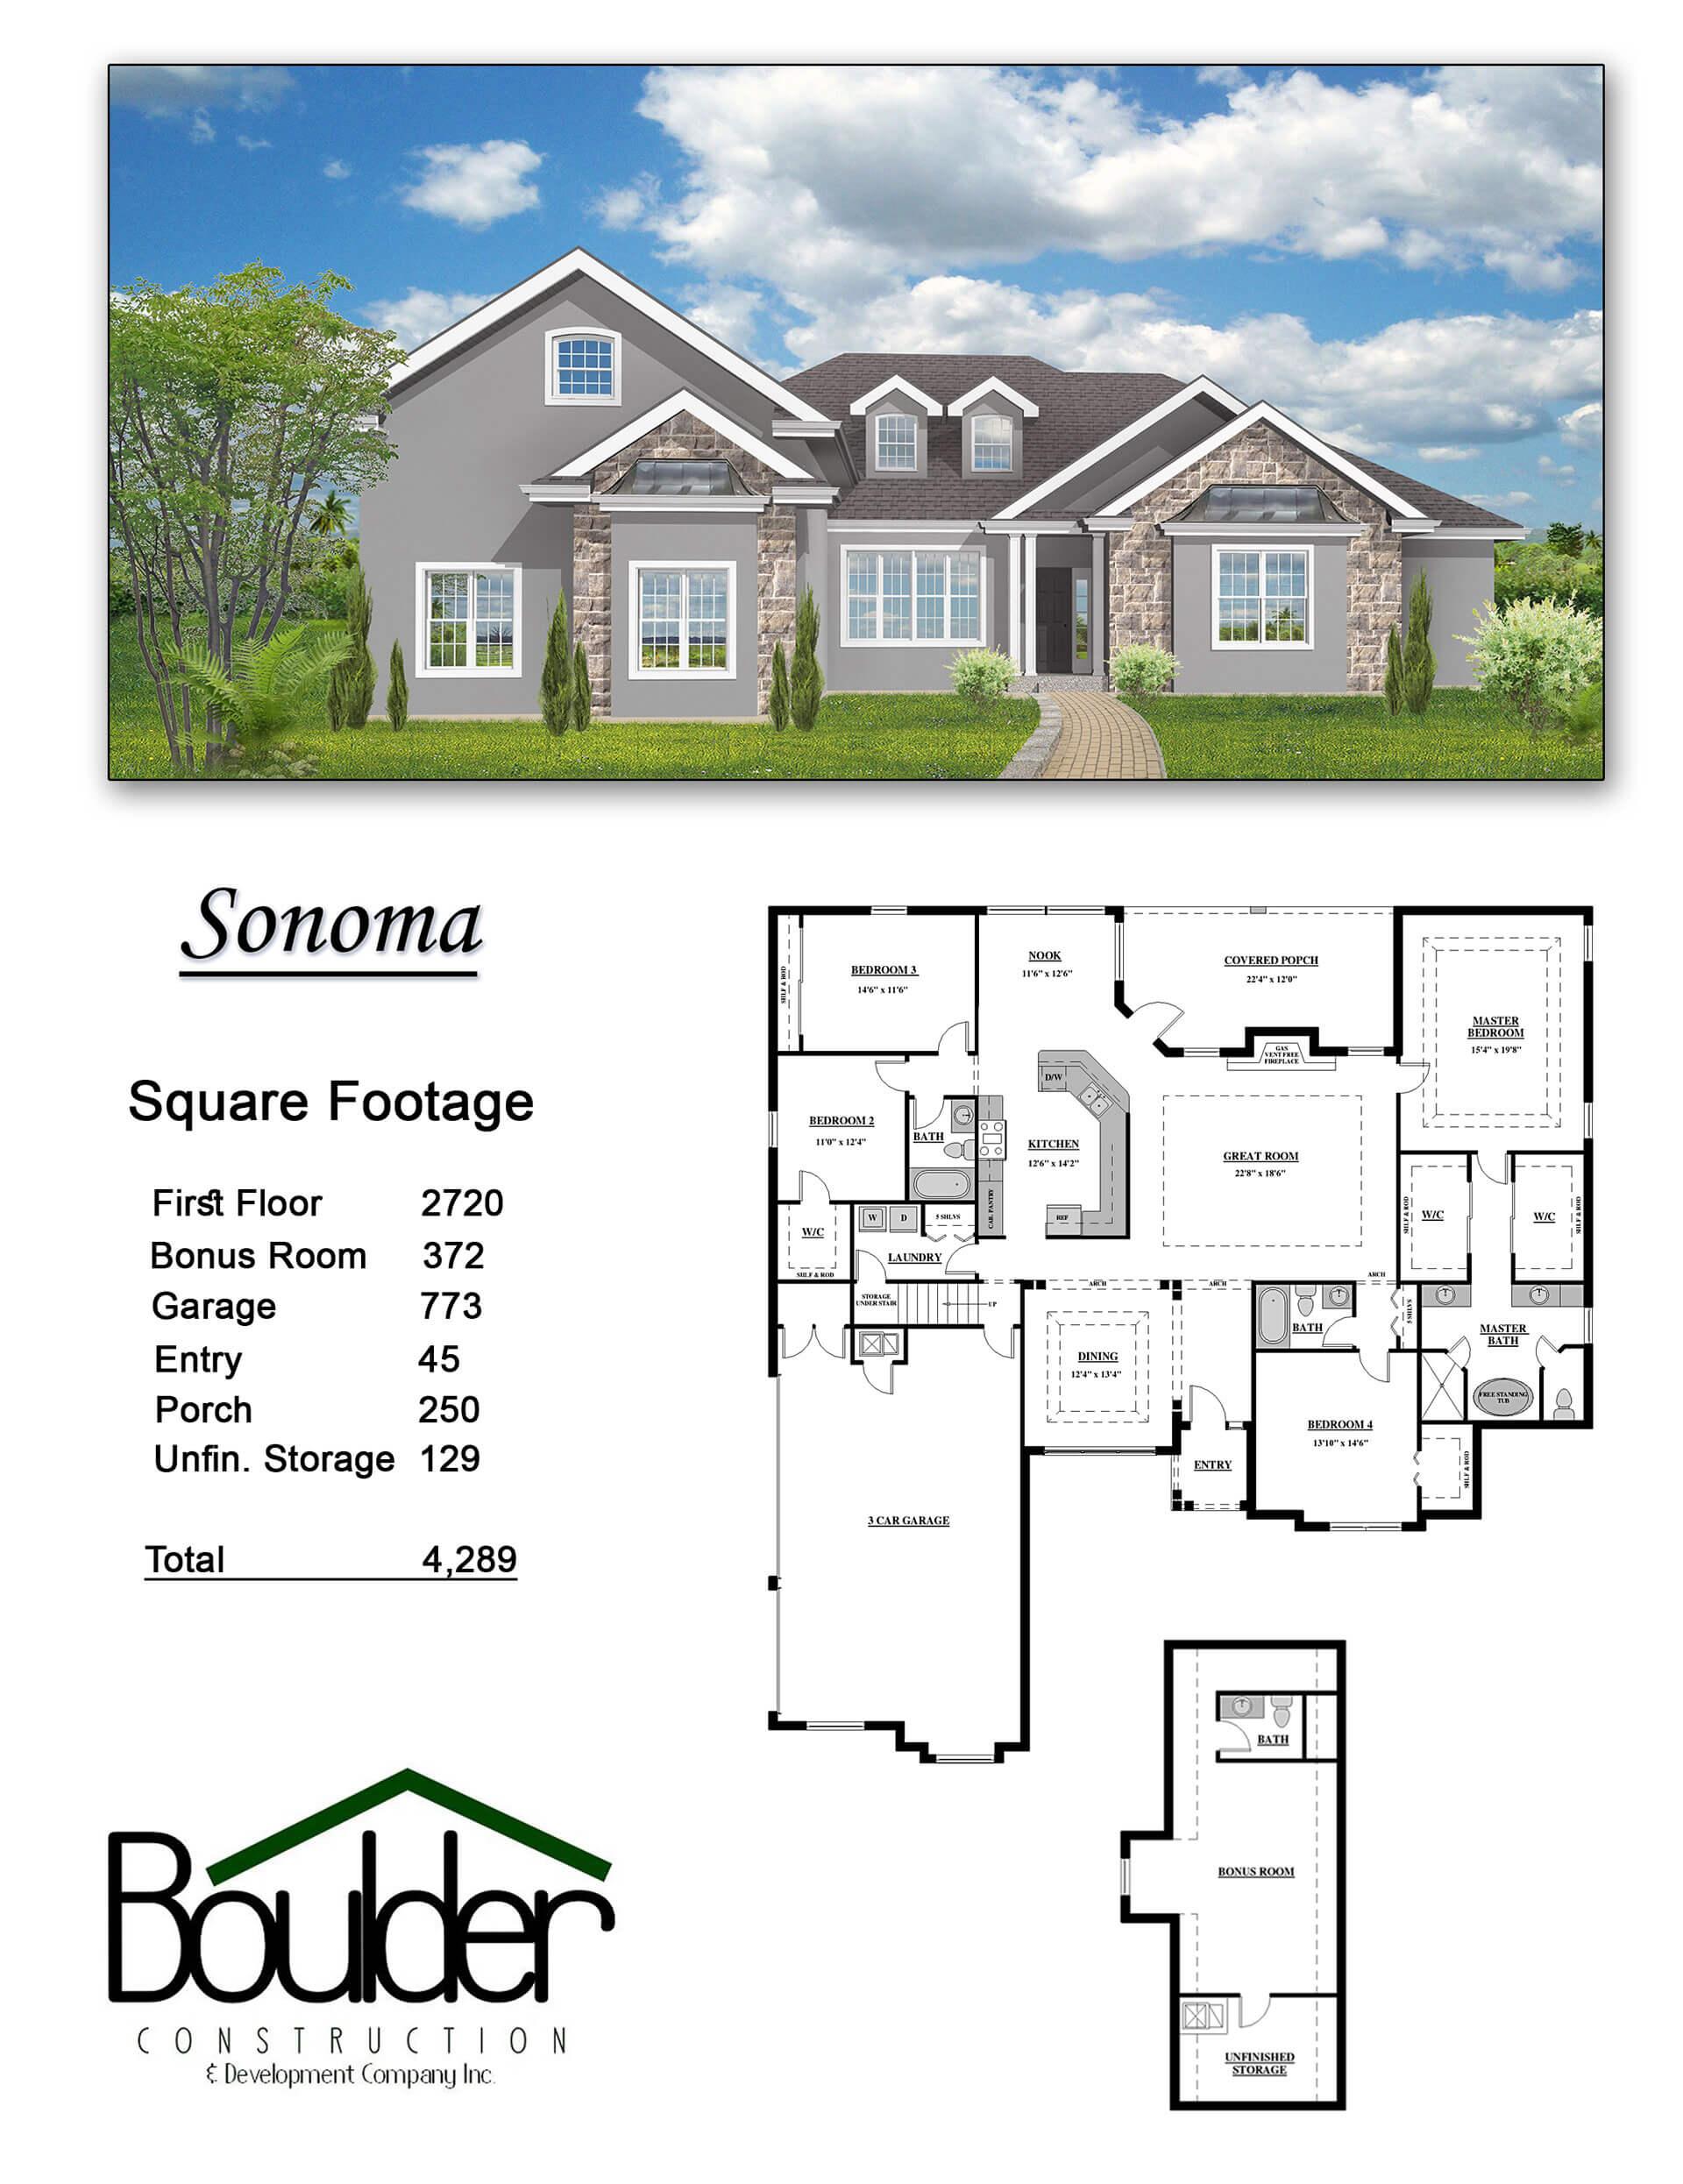 boulder-construction-sonoma-alternate-floor-plan